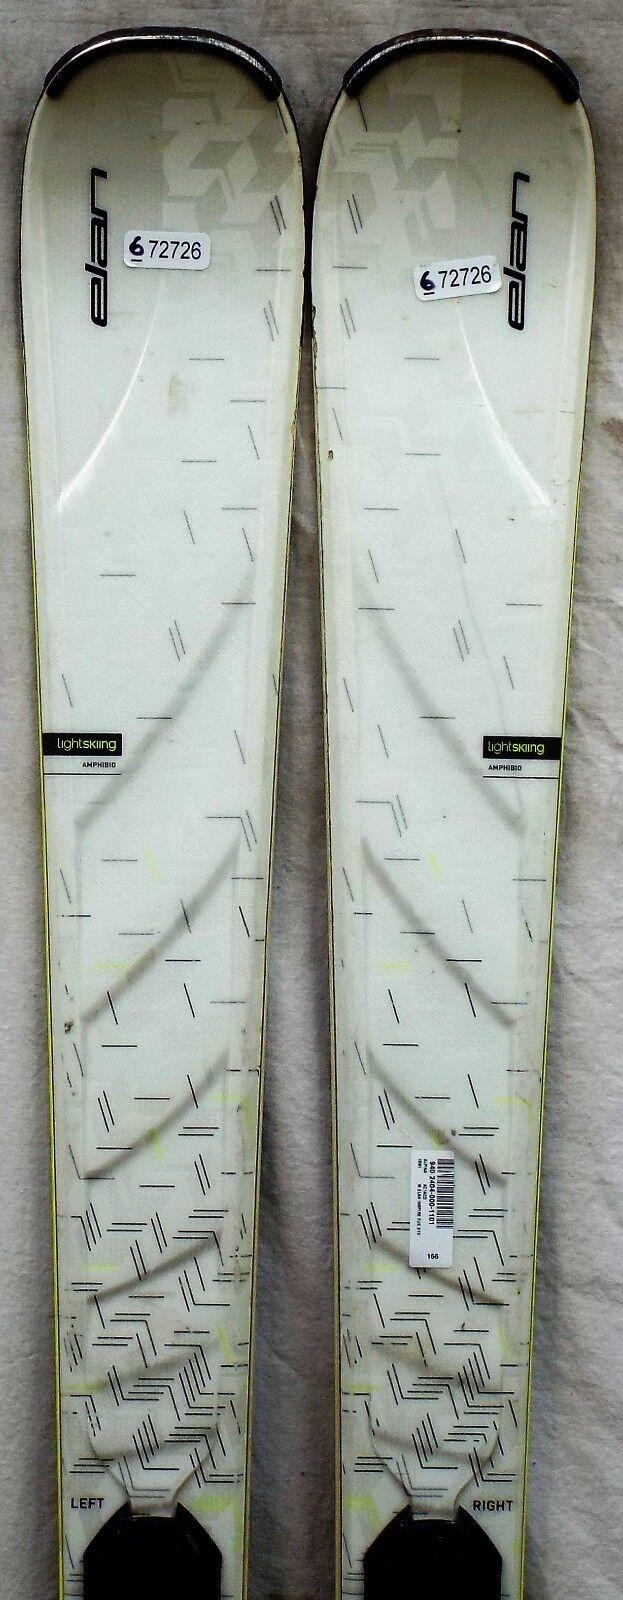 15-16 Elan Inspire Used Women's  Demo Skis w Bindings Size 166cm  hot sale online